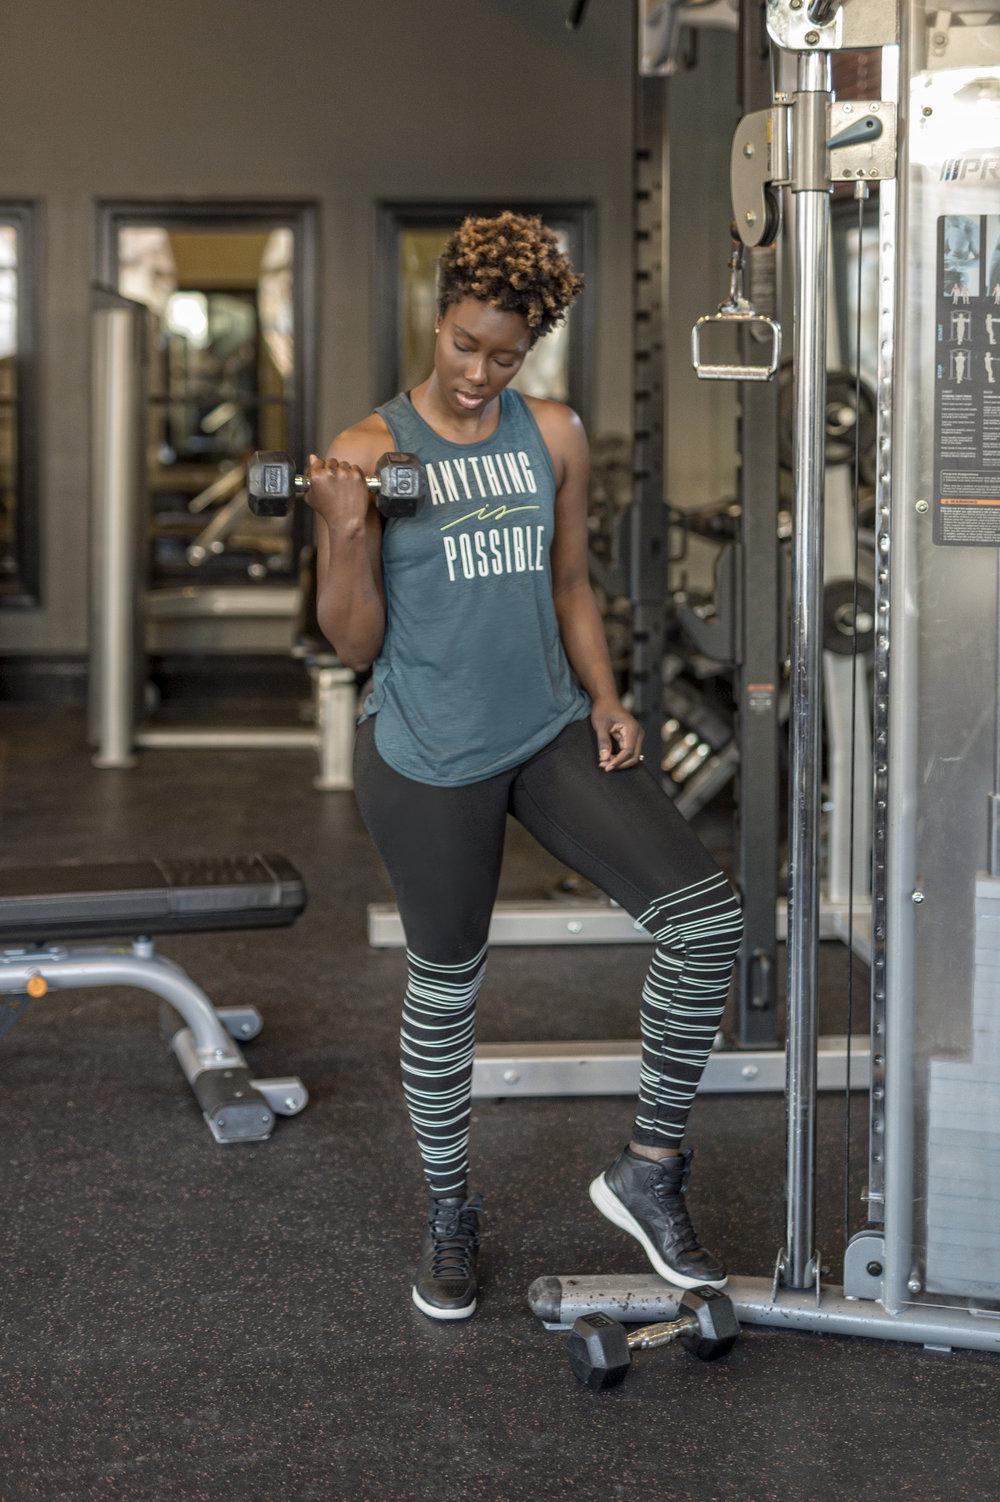 OLD-NAVY-FITNESS-CLOTHES-DAYNA-BOLDEN-fitness-blogger-9.jpg